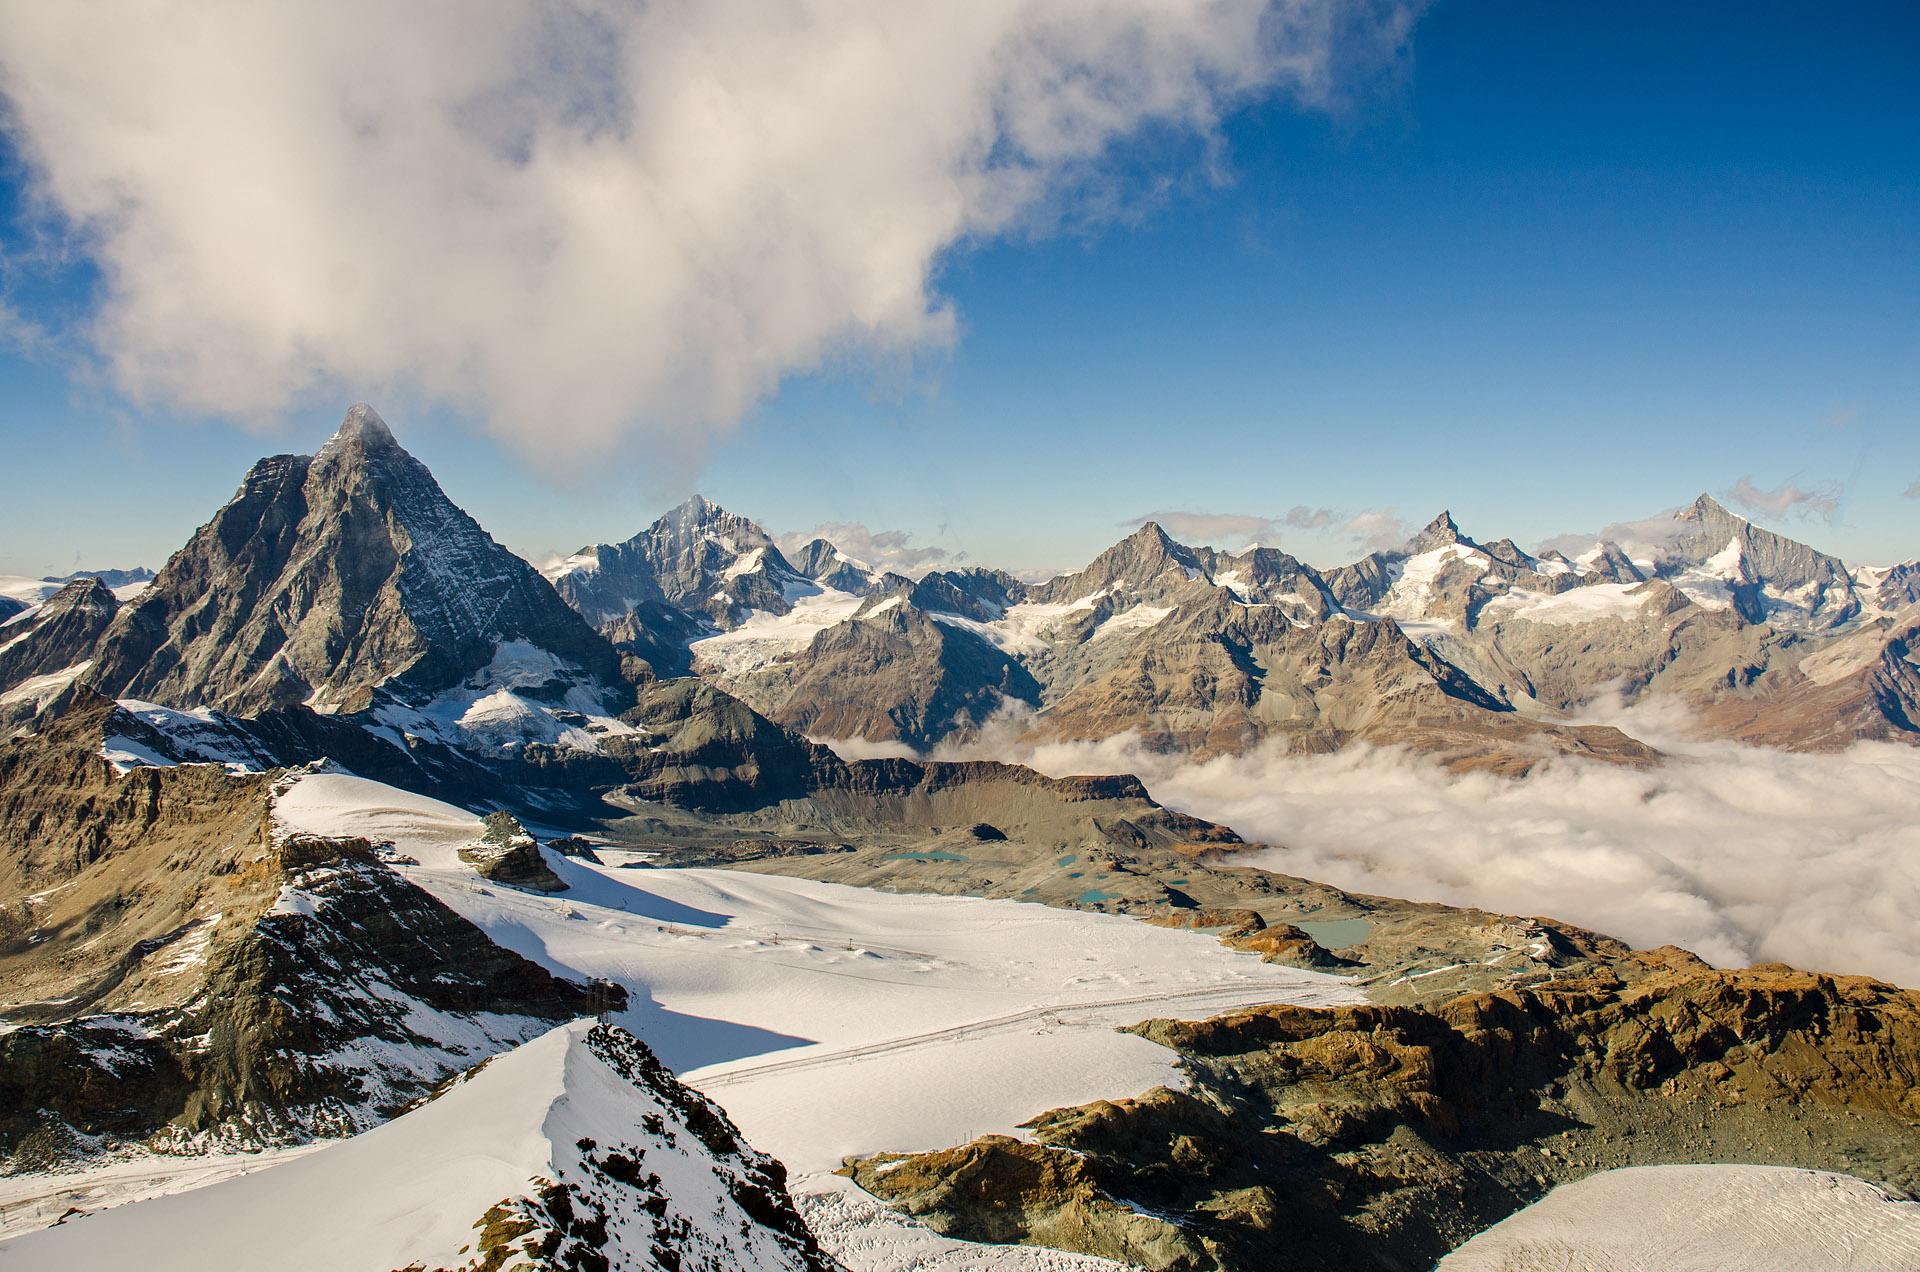 Southern side of the Matterhorn